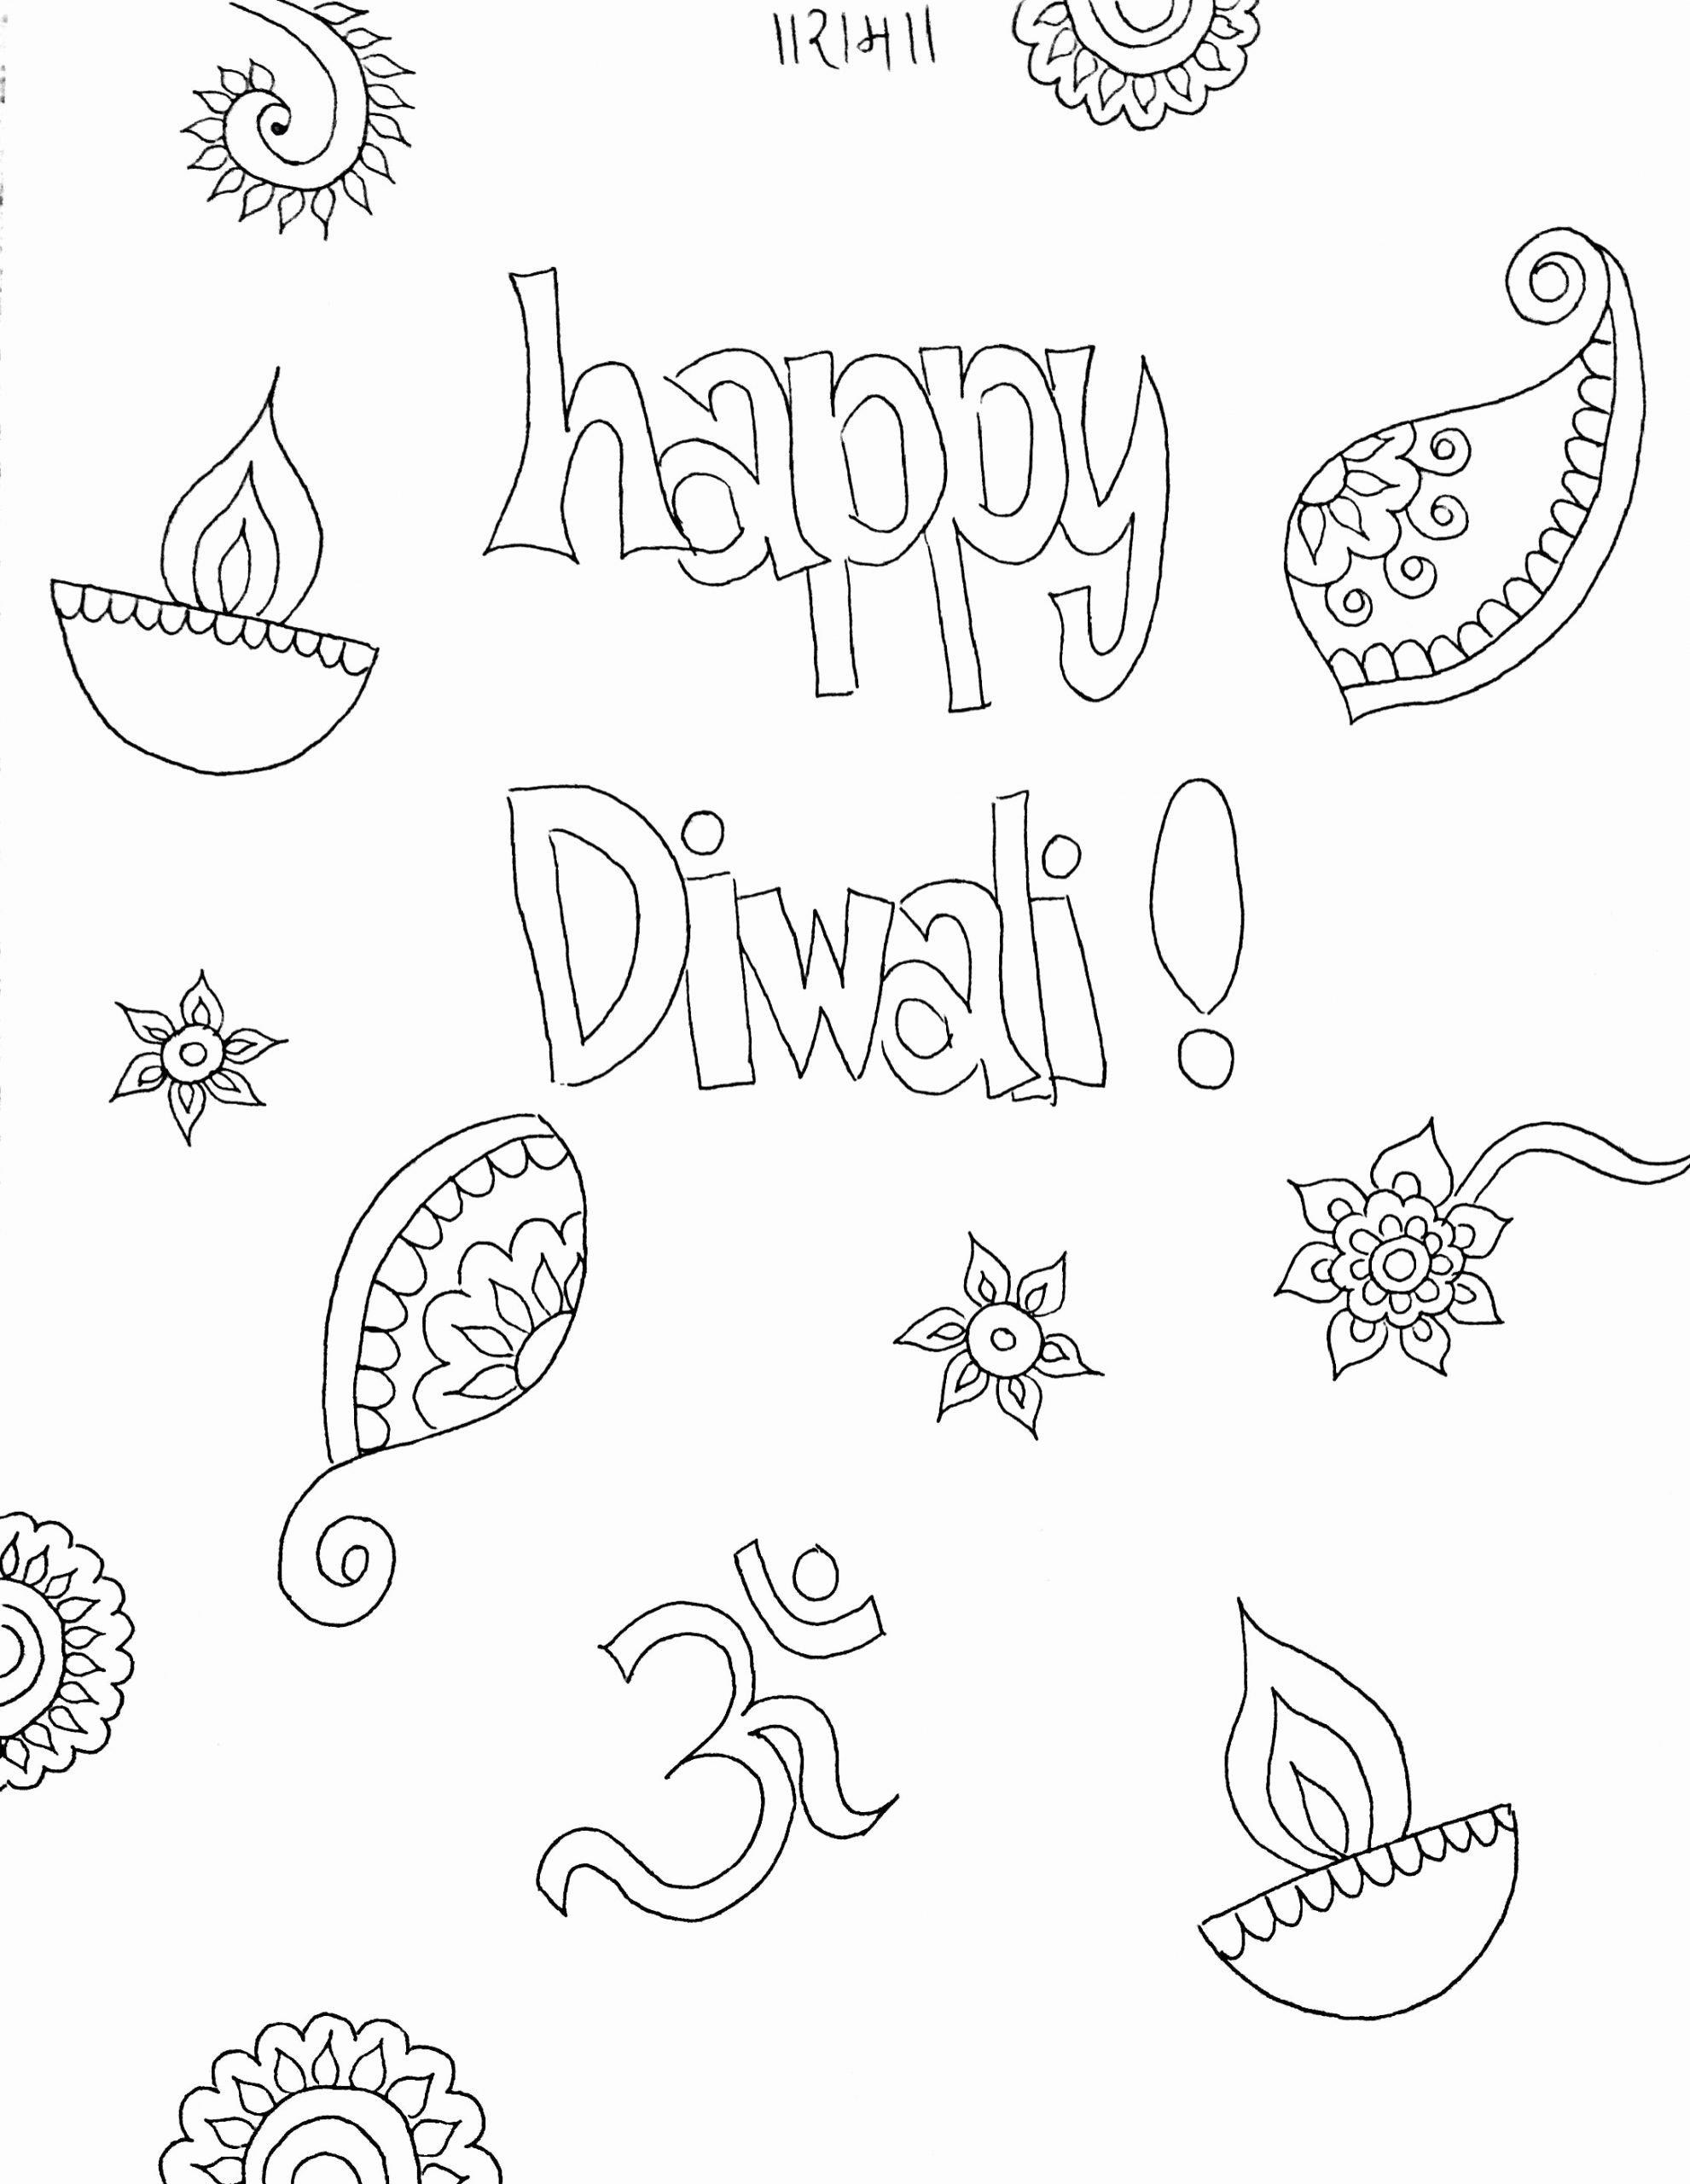 Diwali Worksheets for Preschoolers Ideas Diwali Coloring Sheet for Kids